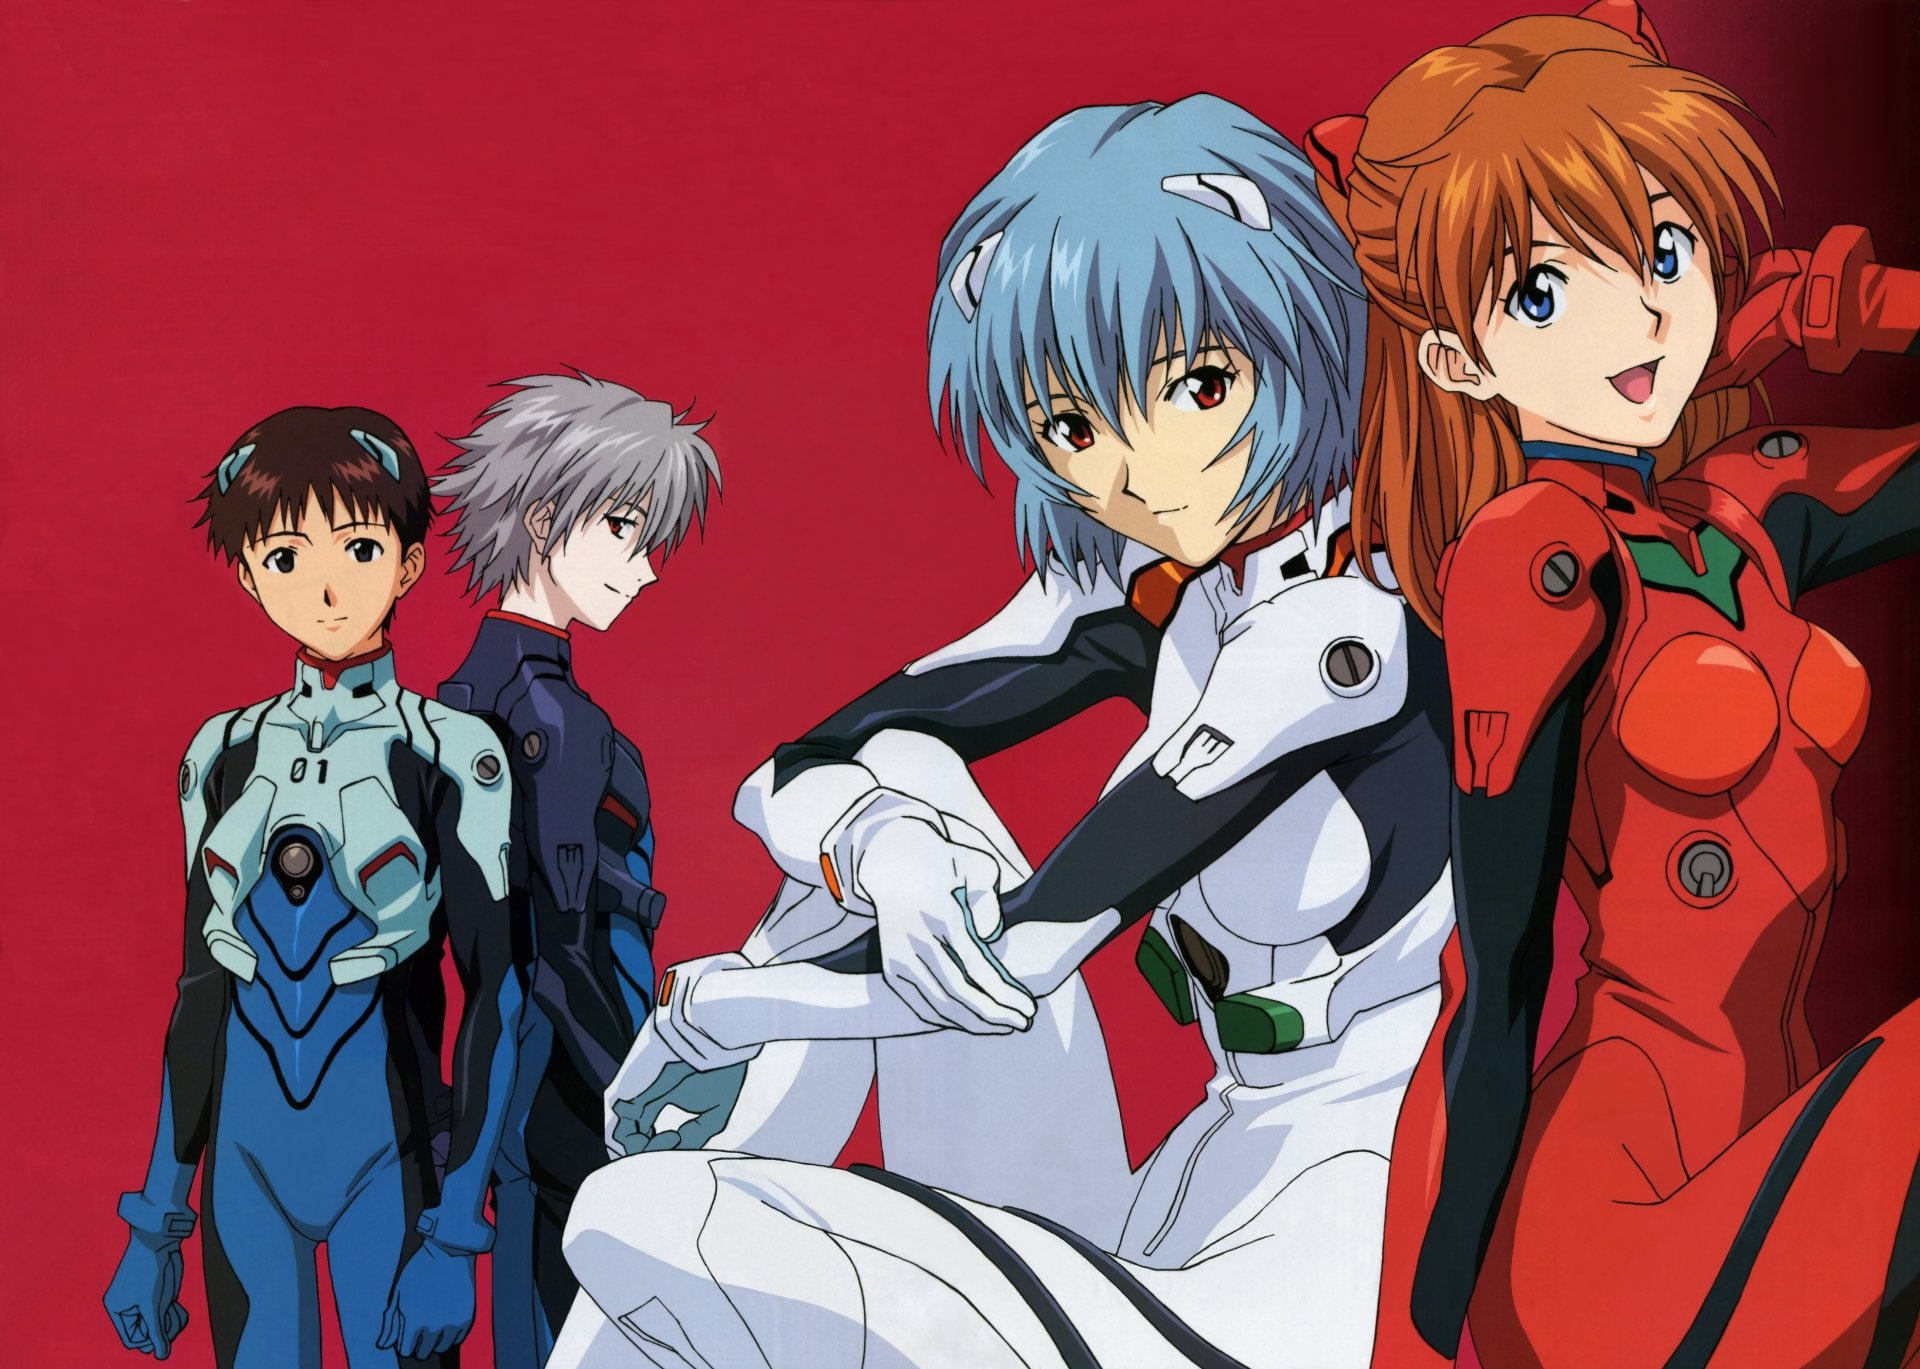 Anime - Neon Genesis Evangelion  Girl Anime Asuka Langley Sohryu Rei Ayanami Shinji Ikari Wallpaper